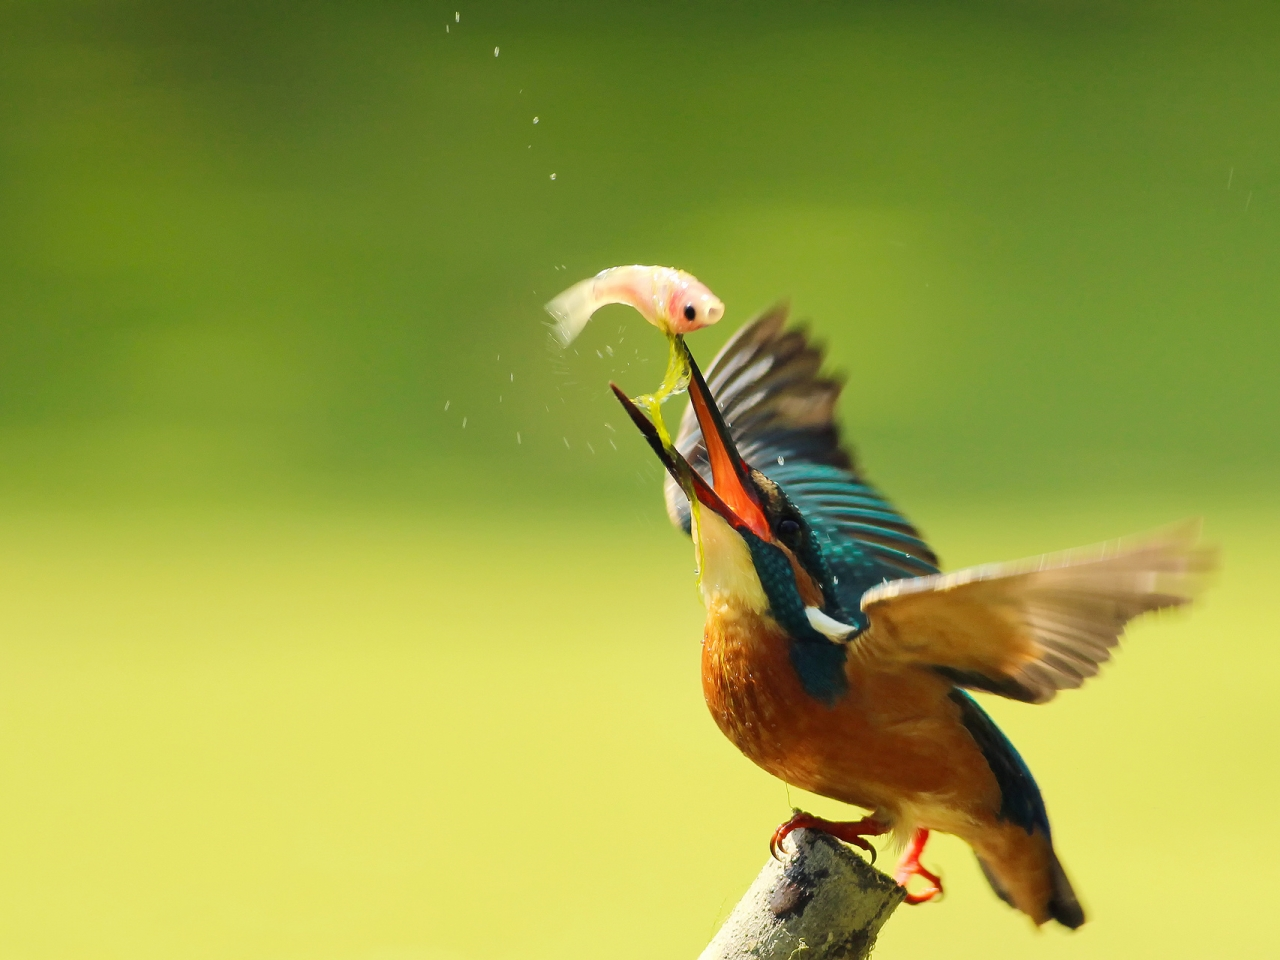 Pájaro pescando - 1280x960